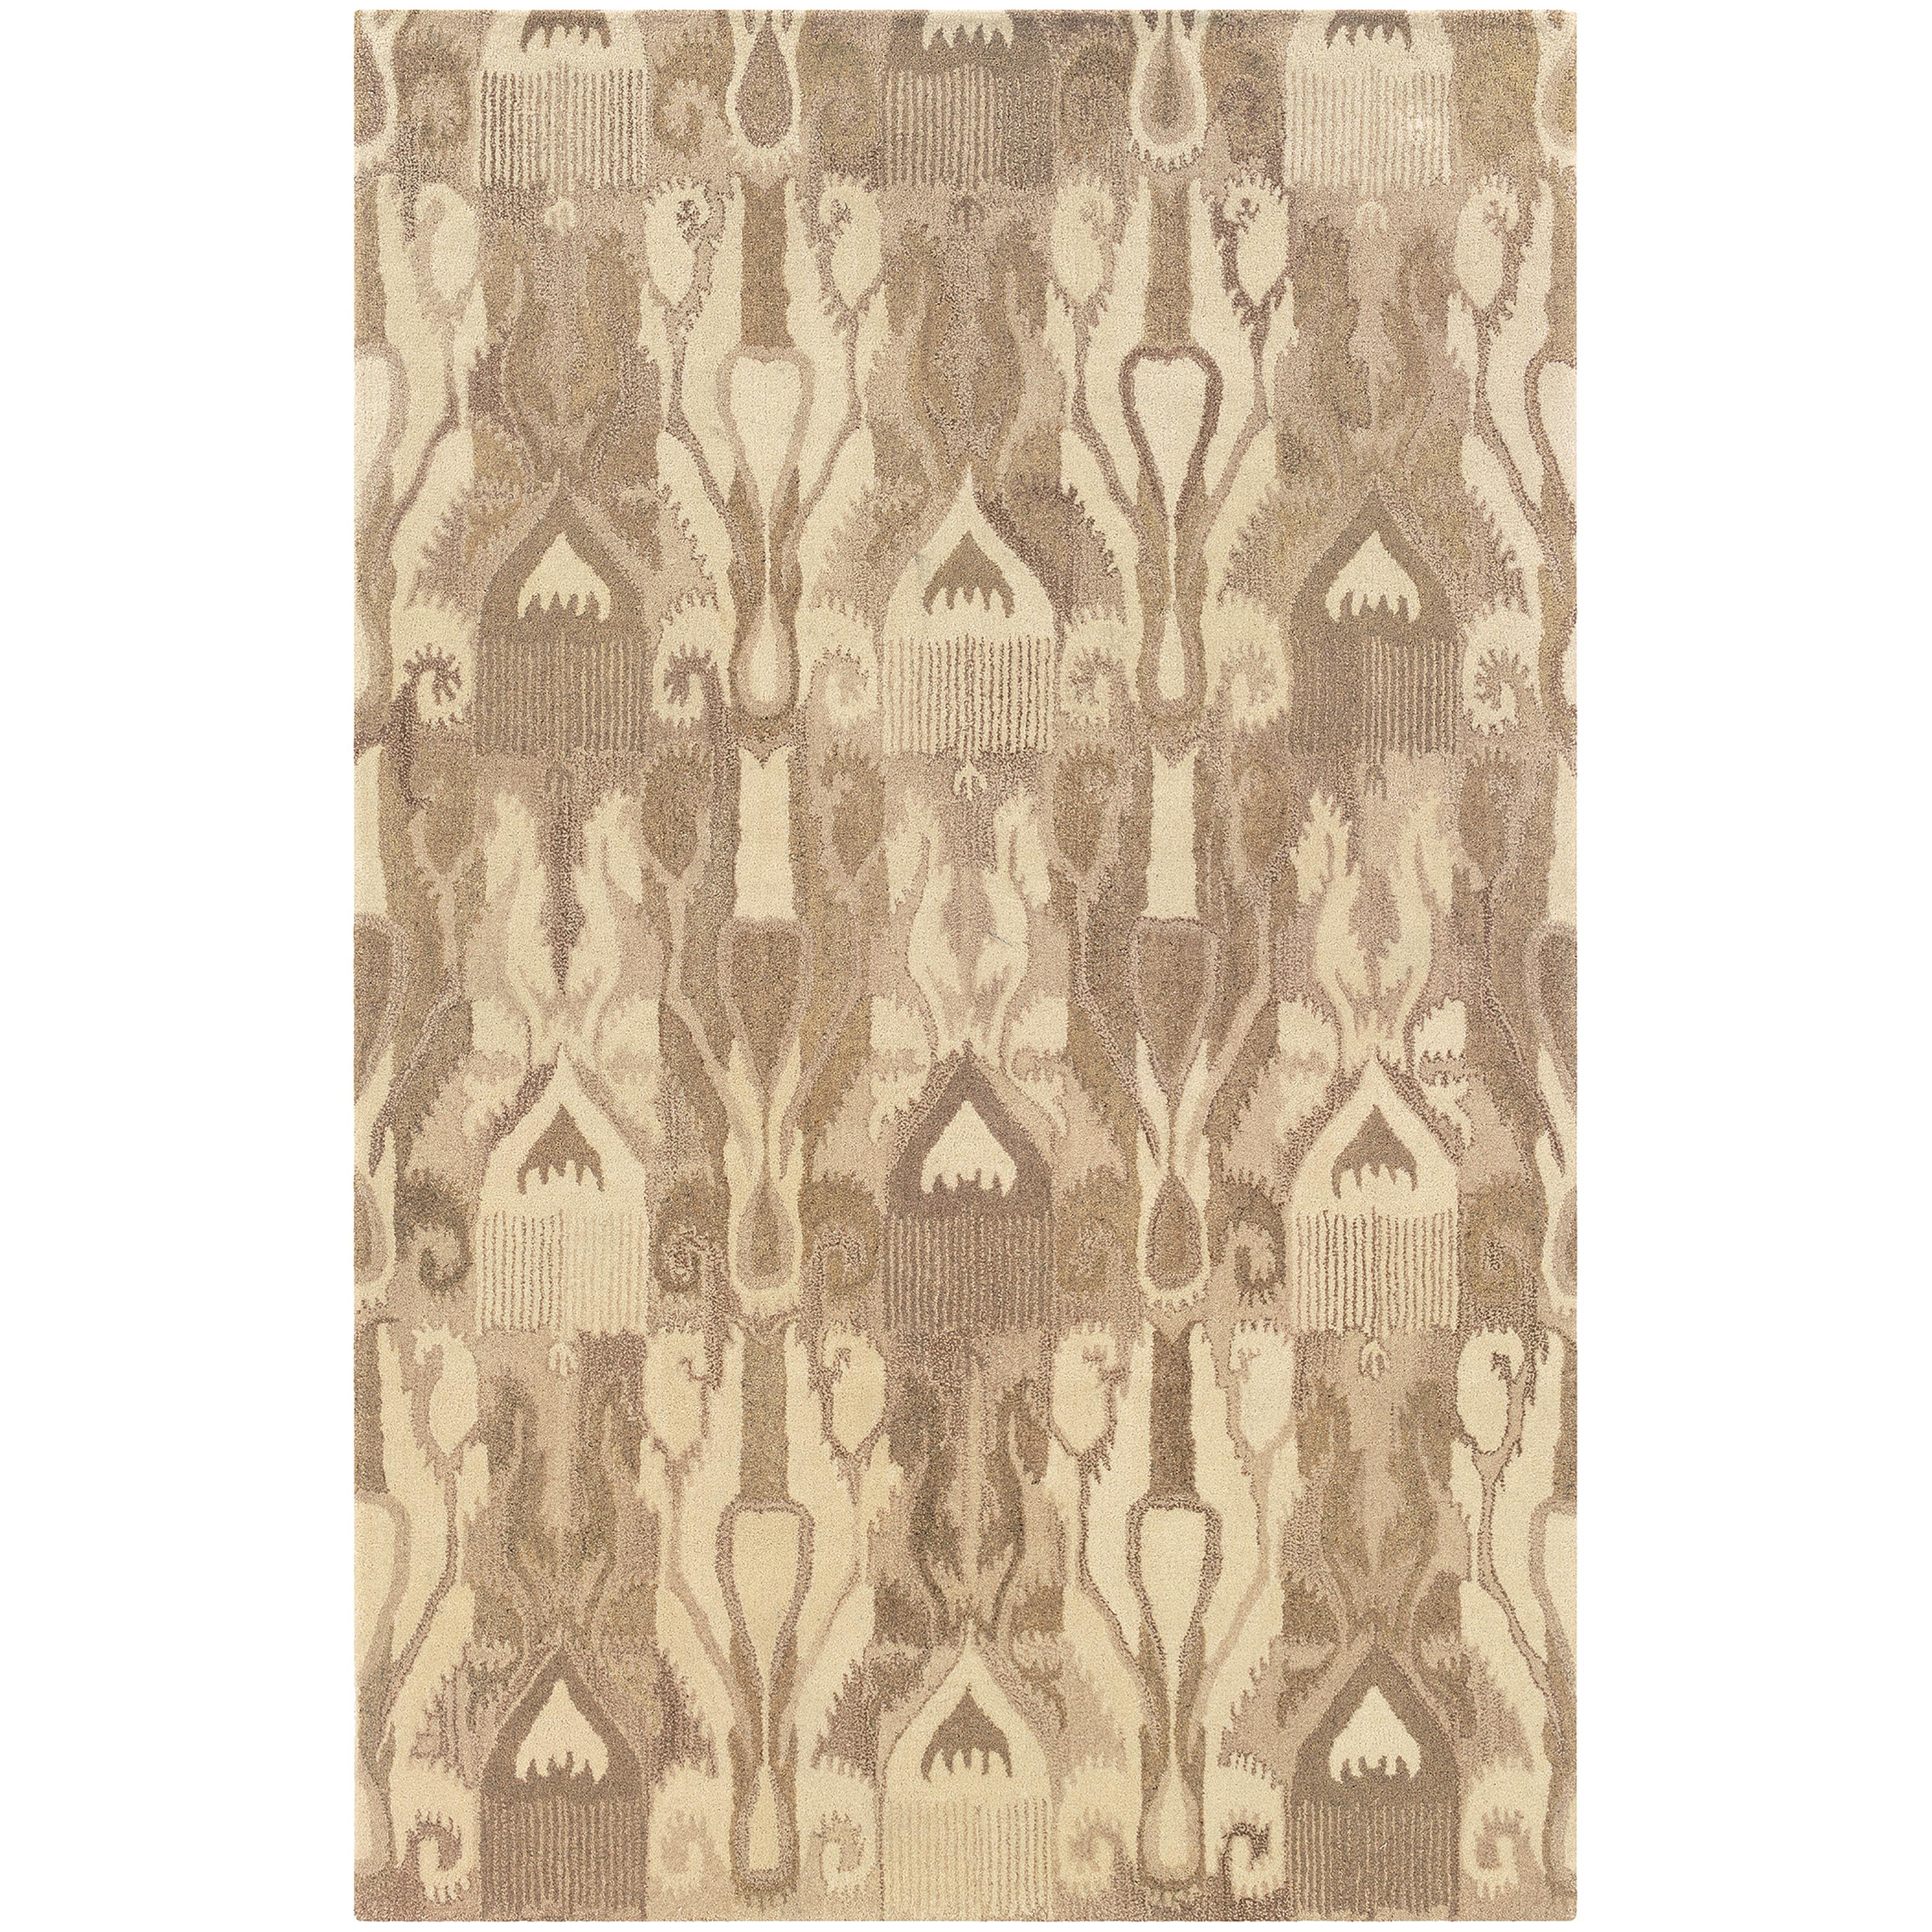 "Oriental Weavers Anastasia 10' 0"" X 13' 0"" Rug - Item Number: A68005305396ST"